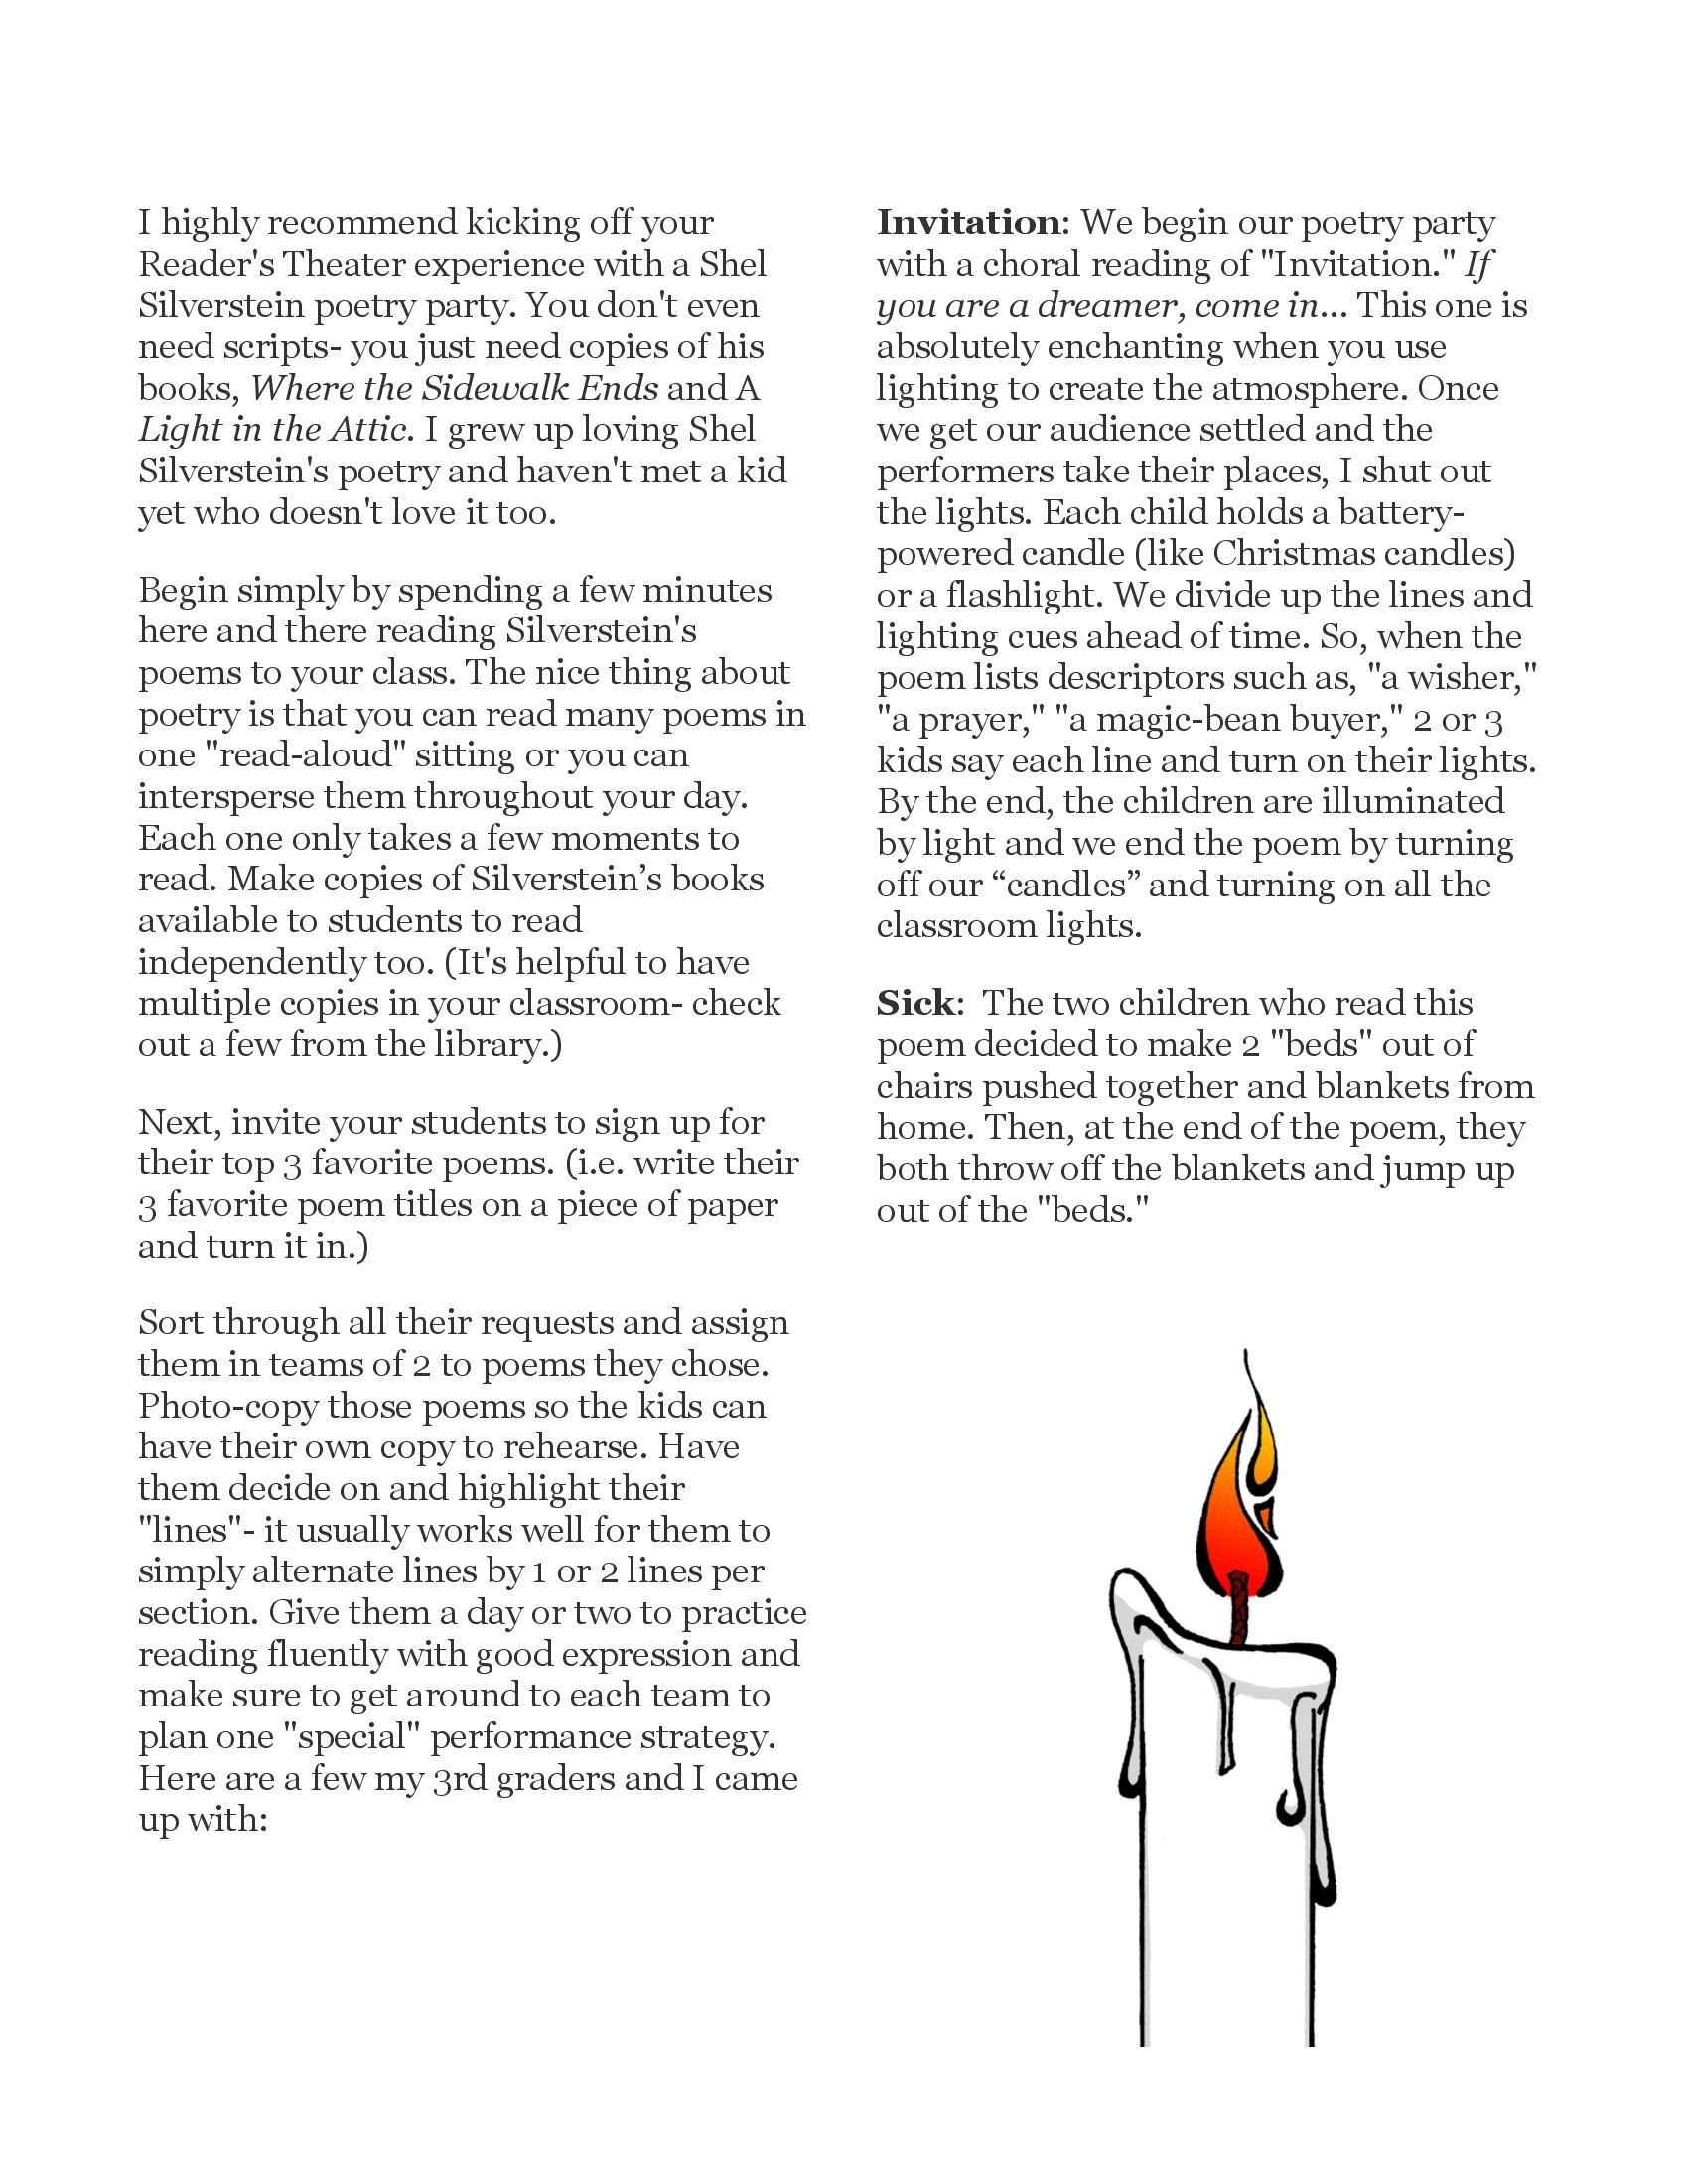 Invitation Poem By Shel Silverstein - Letter BestKitchenView CO